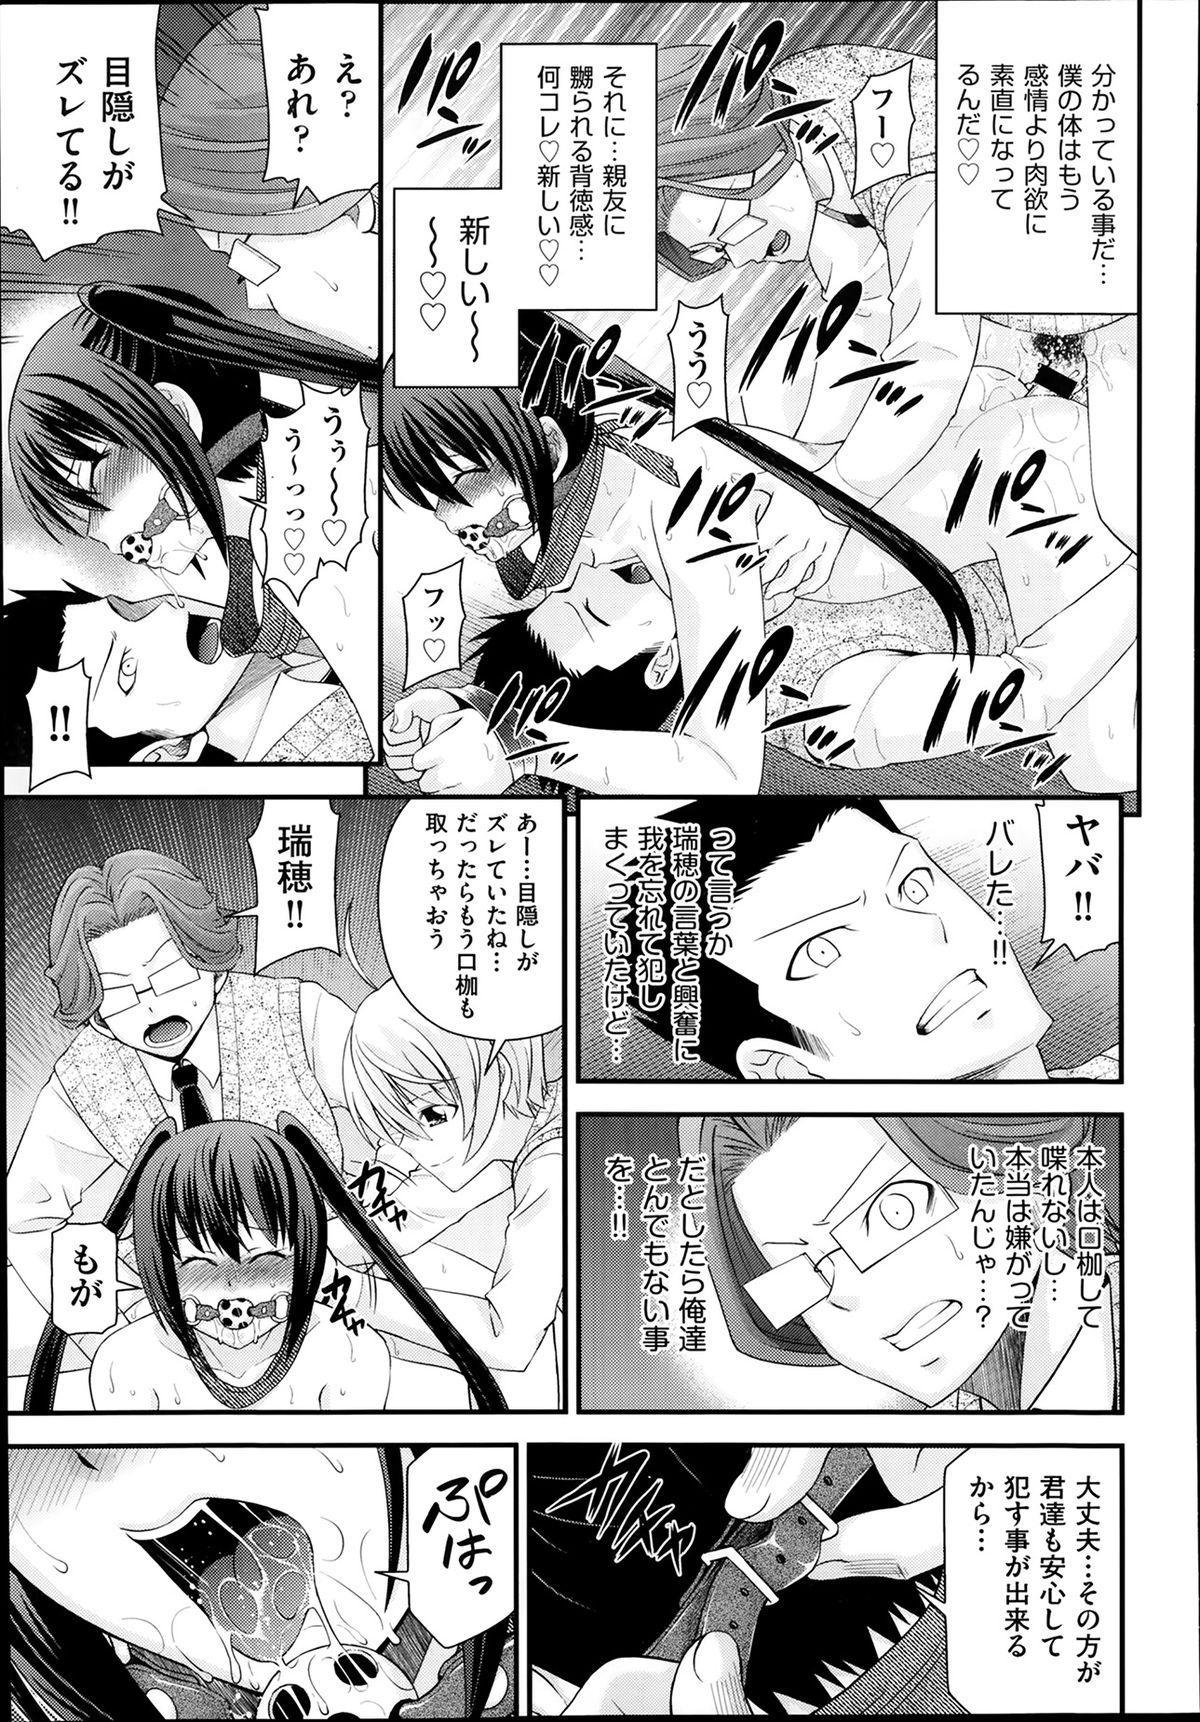 Kyoudai Replace 88